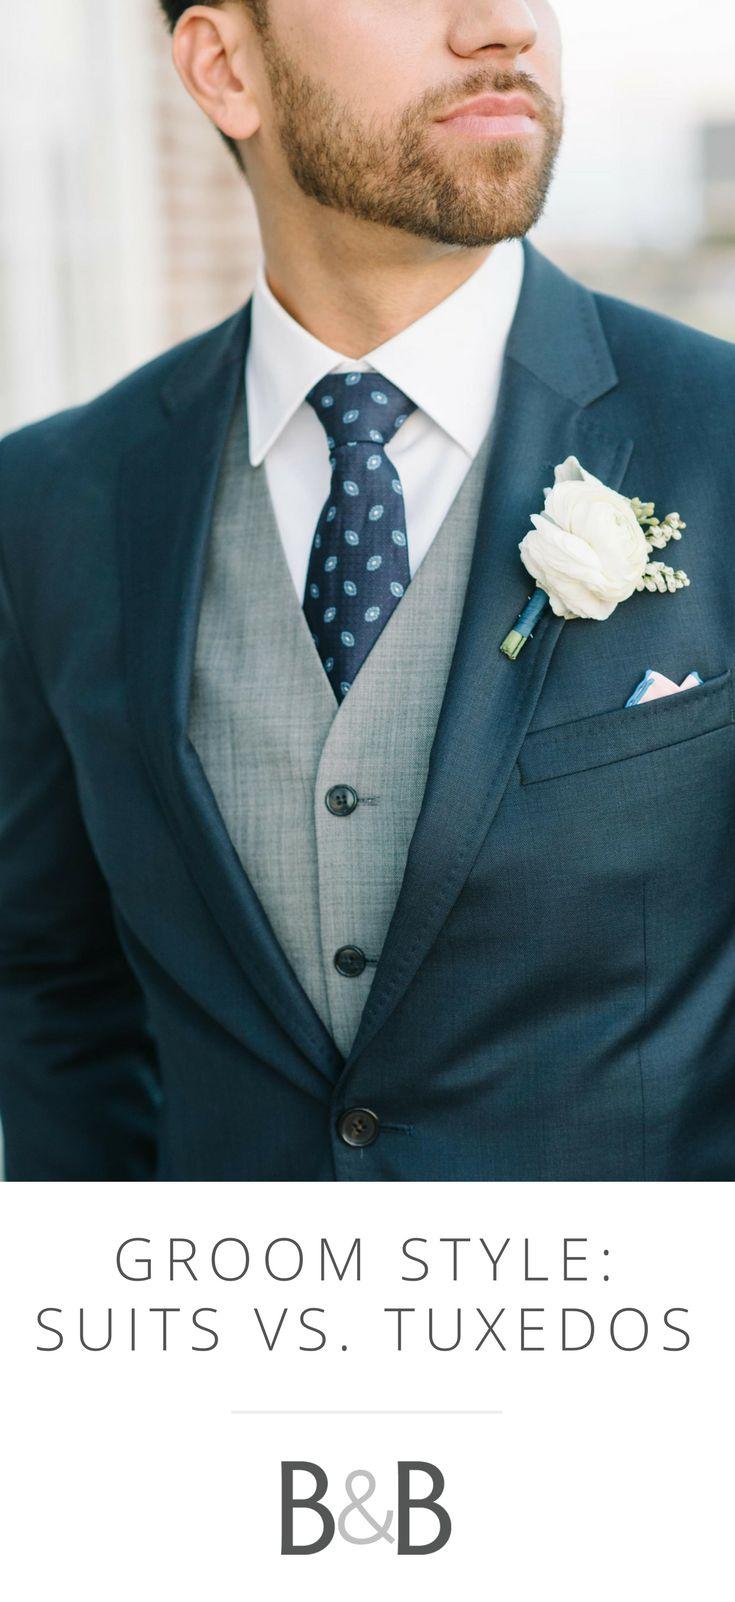 Groom fashion, tuxedo vs suit, tux, groomsmen style, wedding outfits // Aaron and Jillian Photography